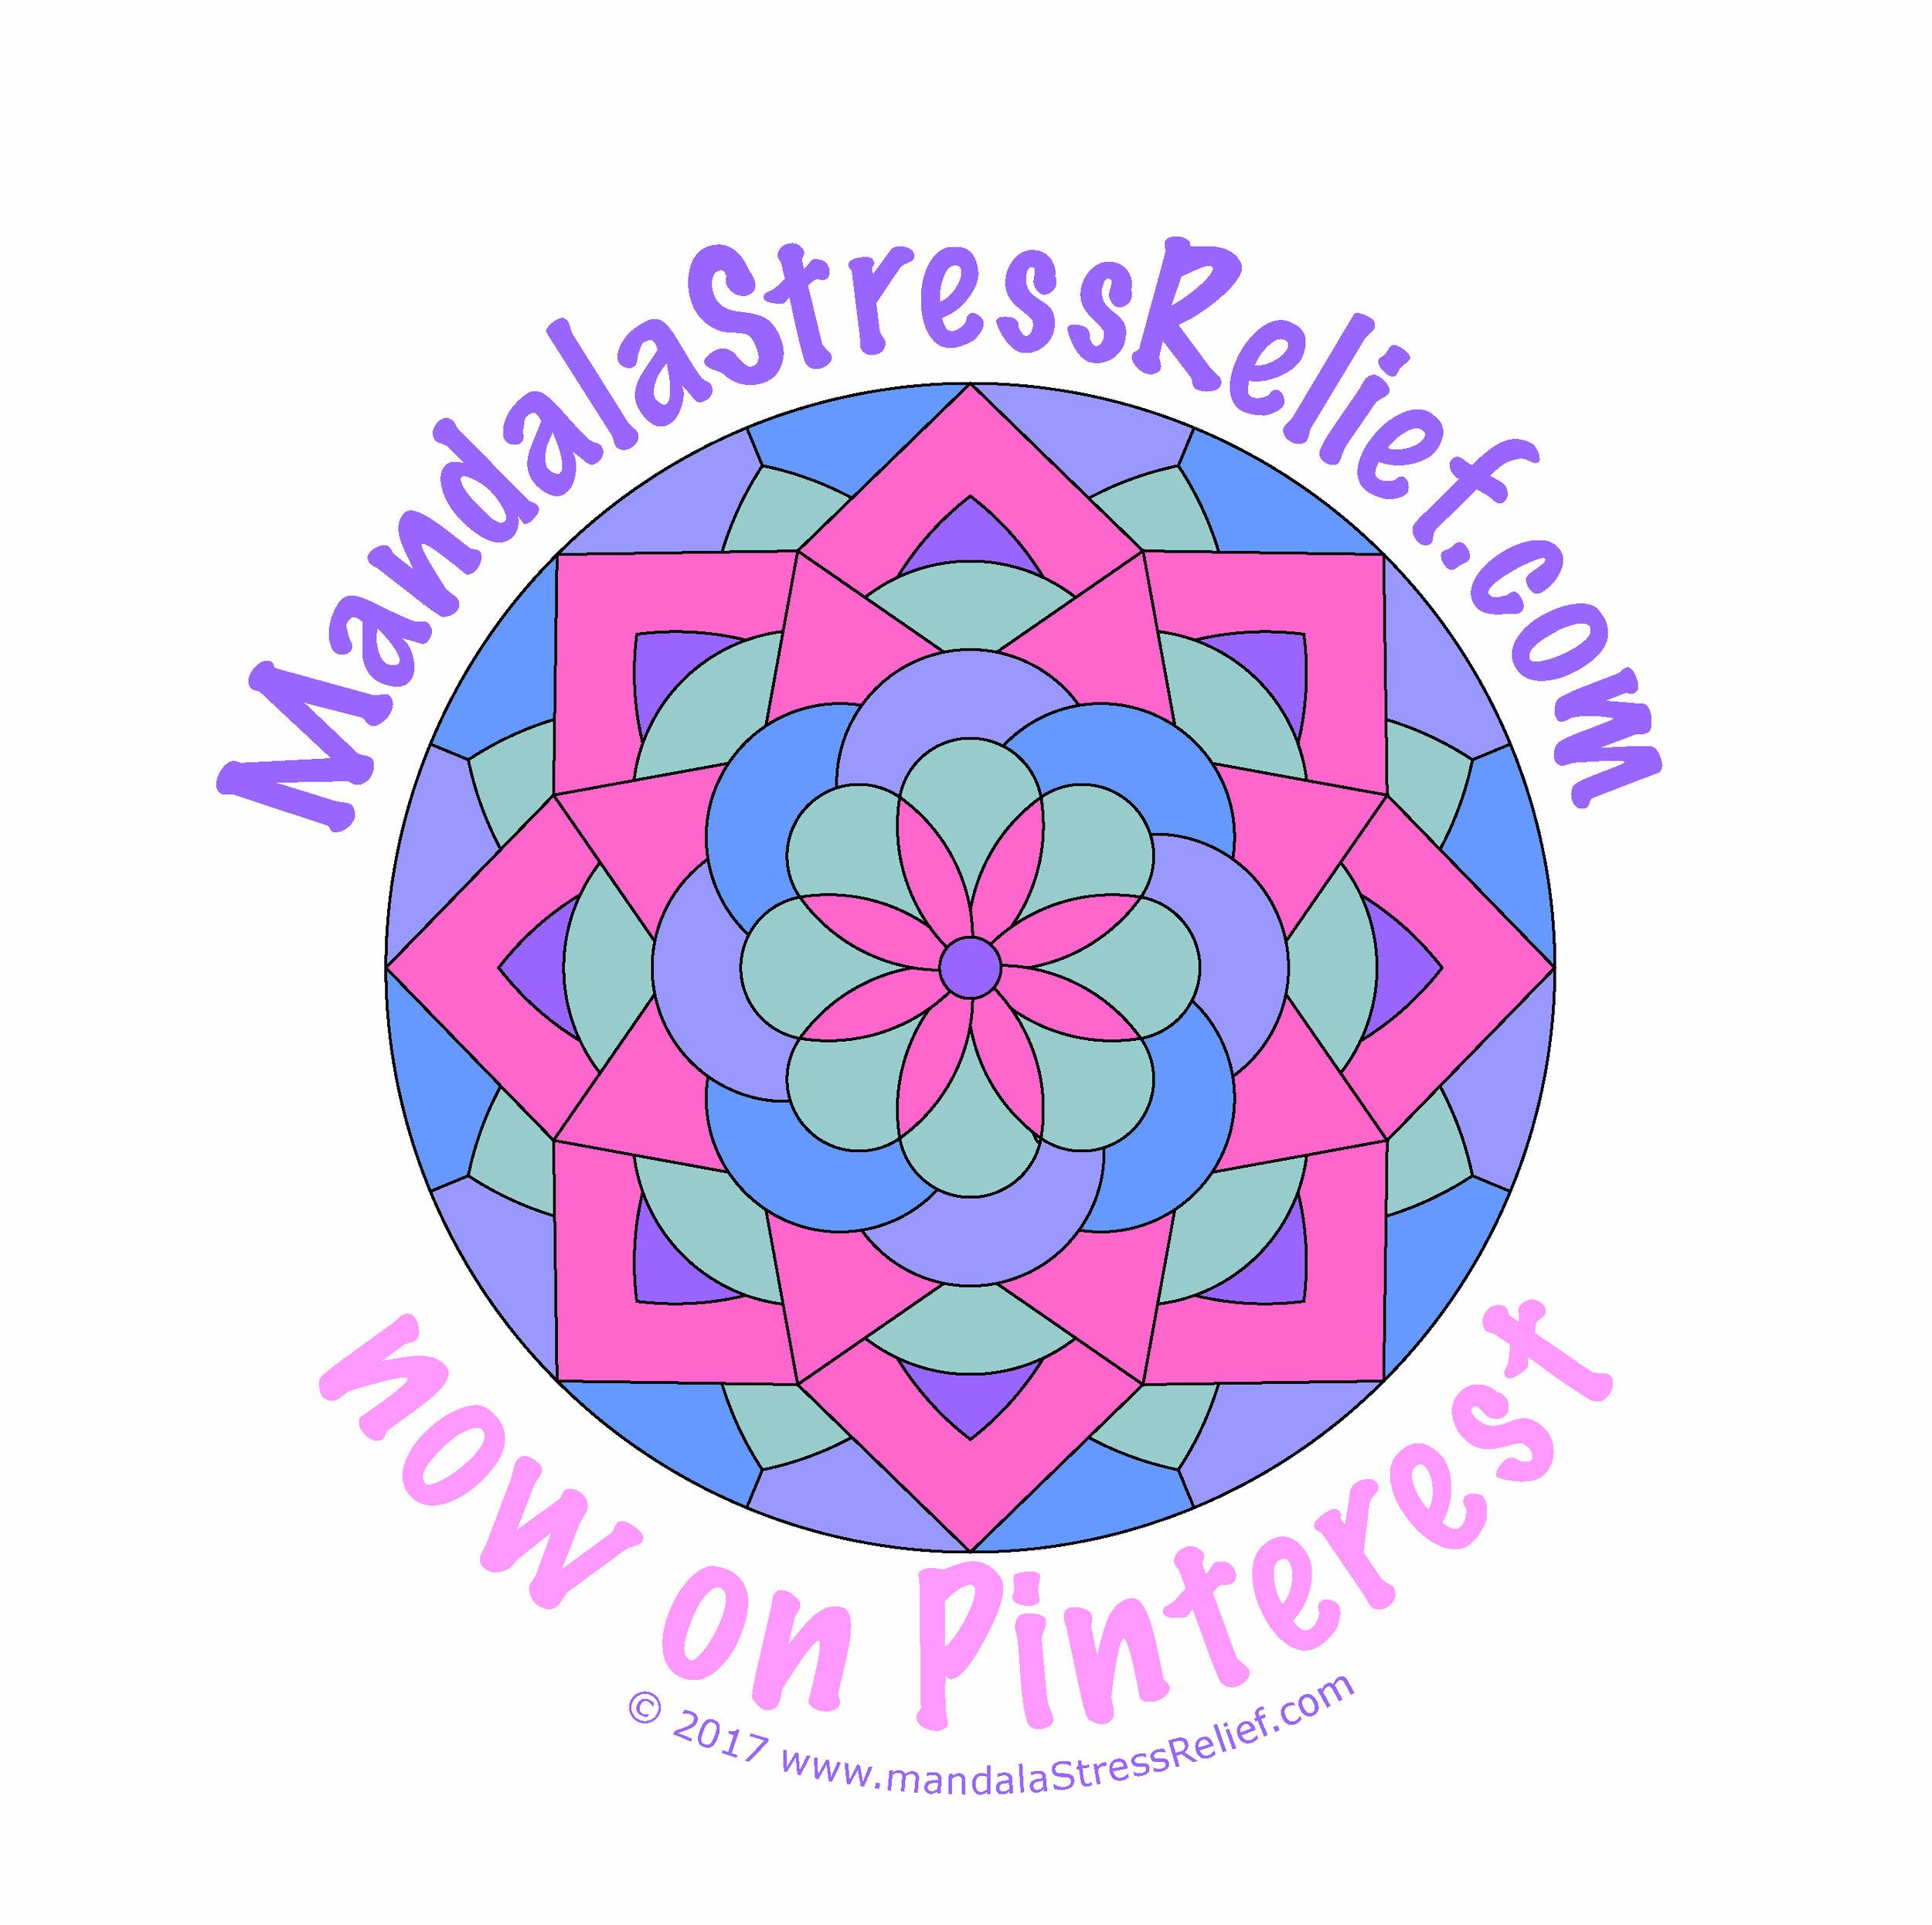 Visit me on Pinterest: https://www.pinterest.ca/mandalastressrelief/